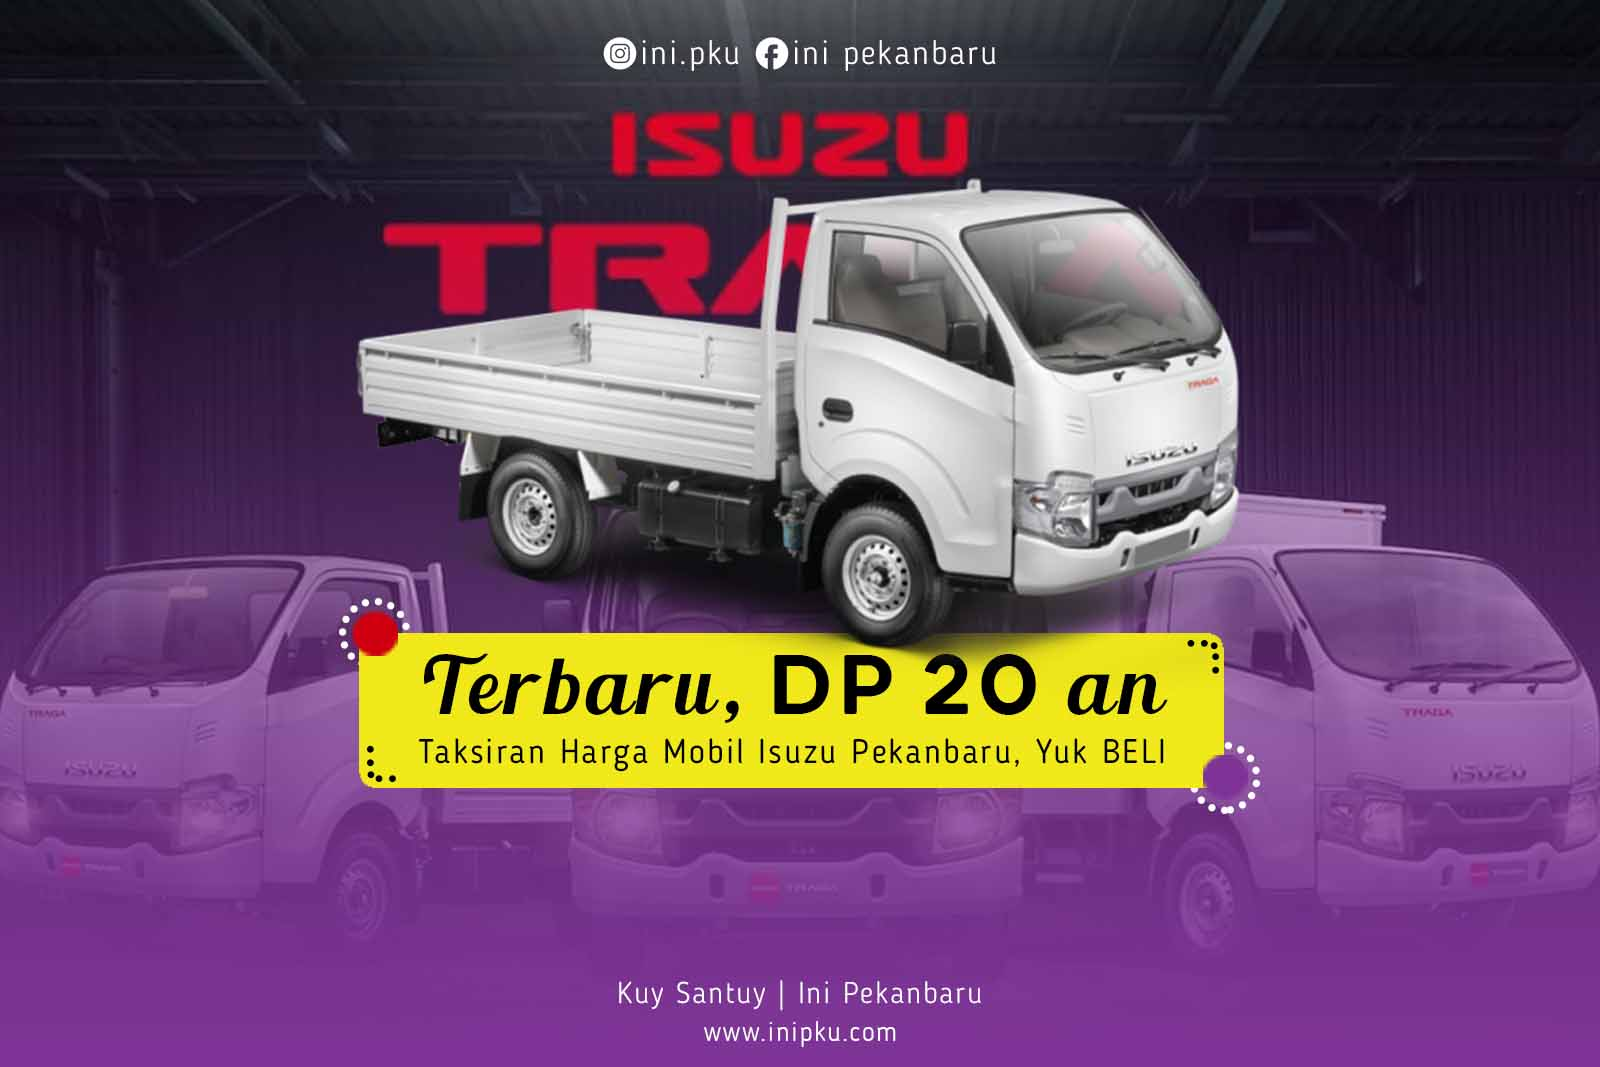 Terbaru DP 20 an, Taksiran Harga Mobil Isuzu Pekanbaru, Yuk BELI